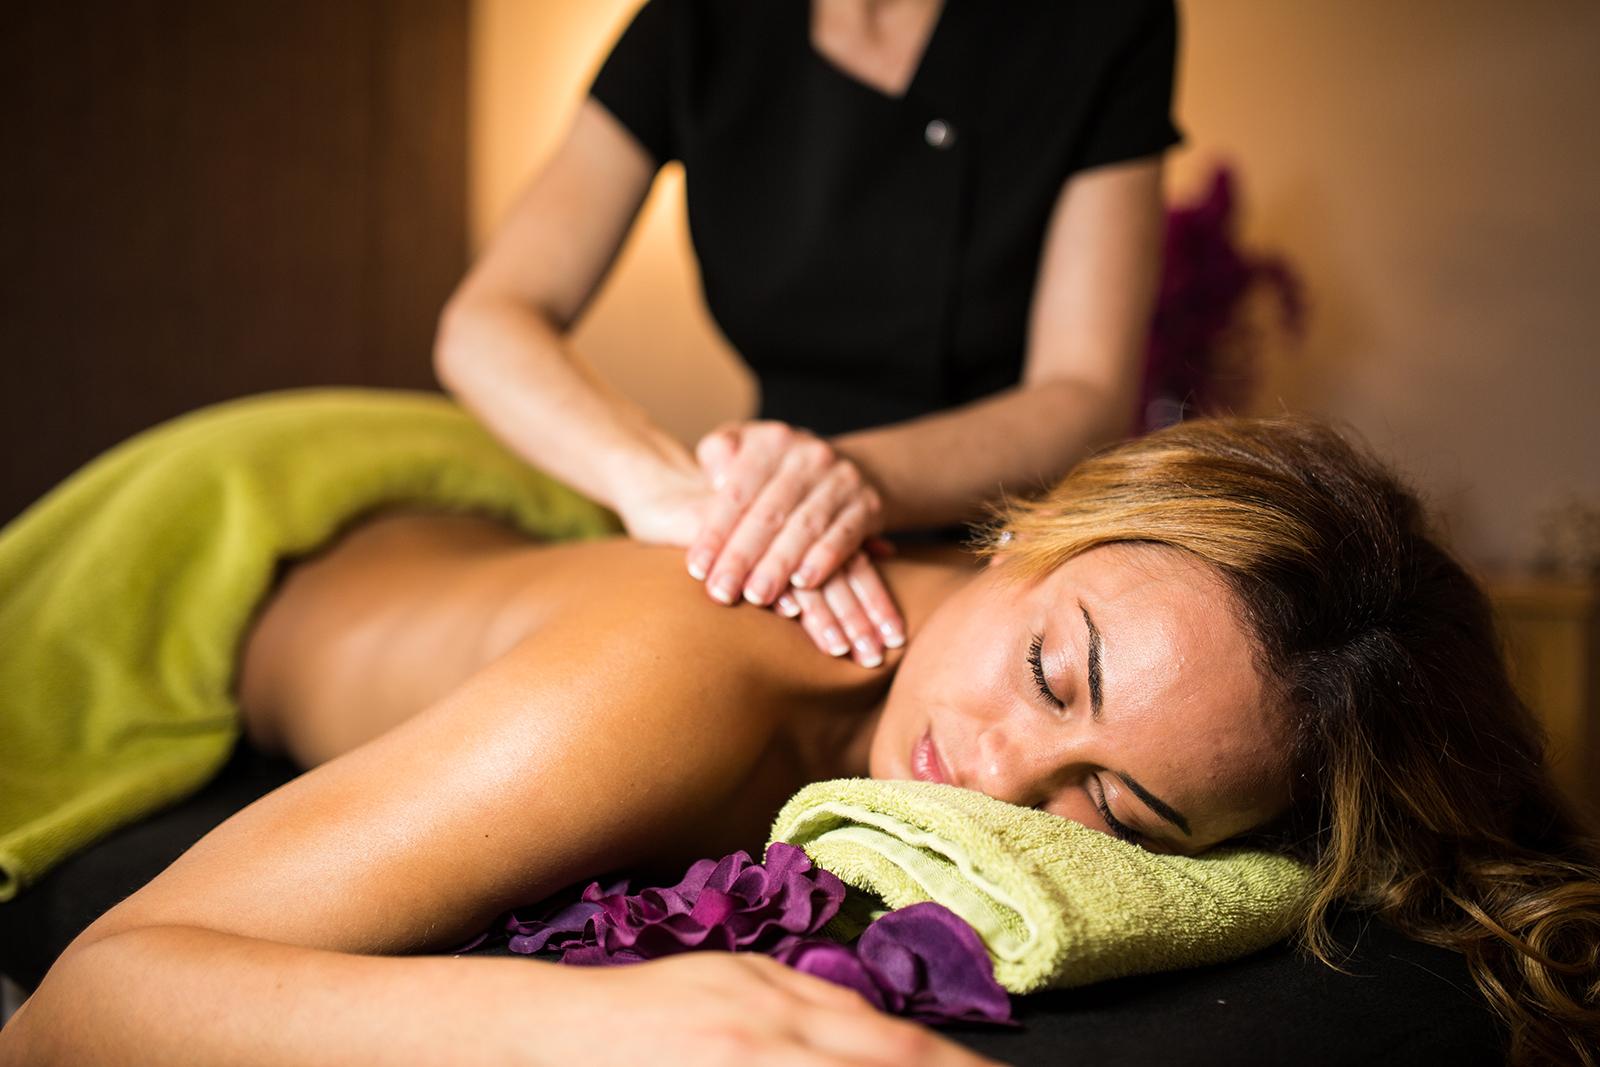 body massage stockholm erotik svensk